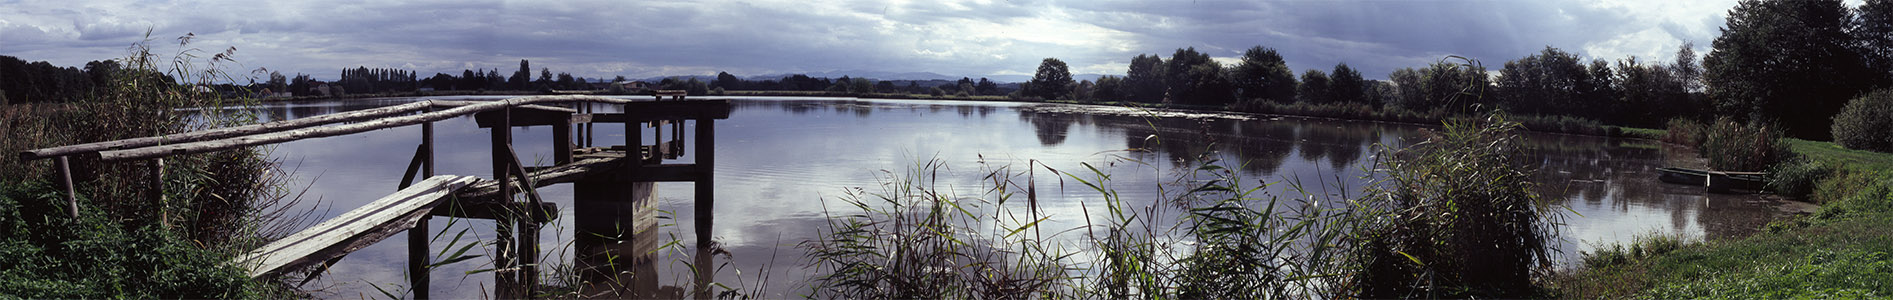 Spätsommer am Teich